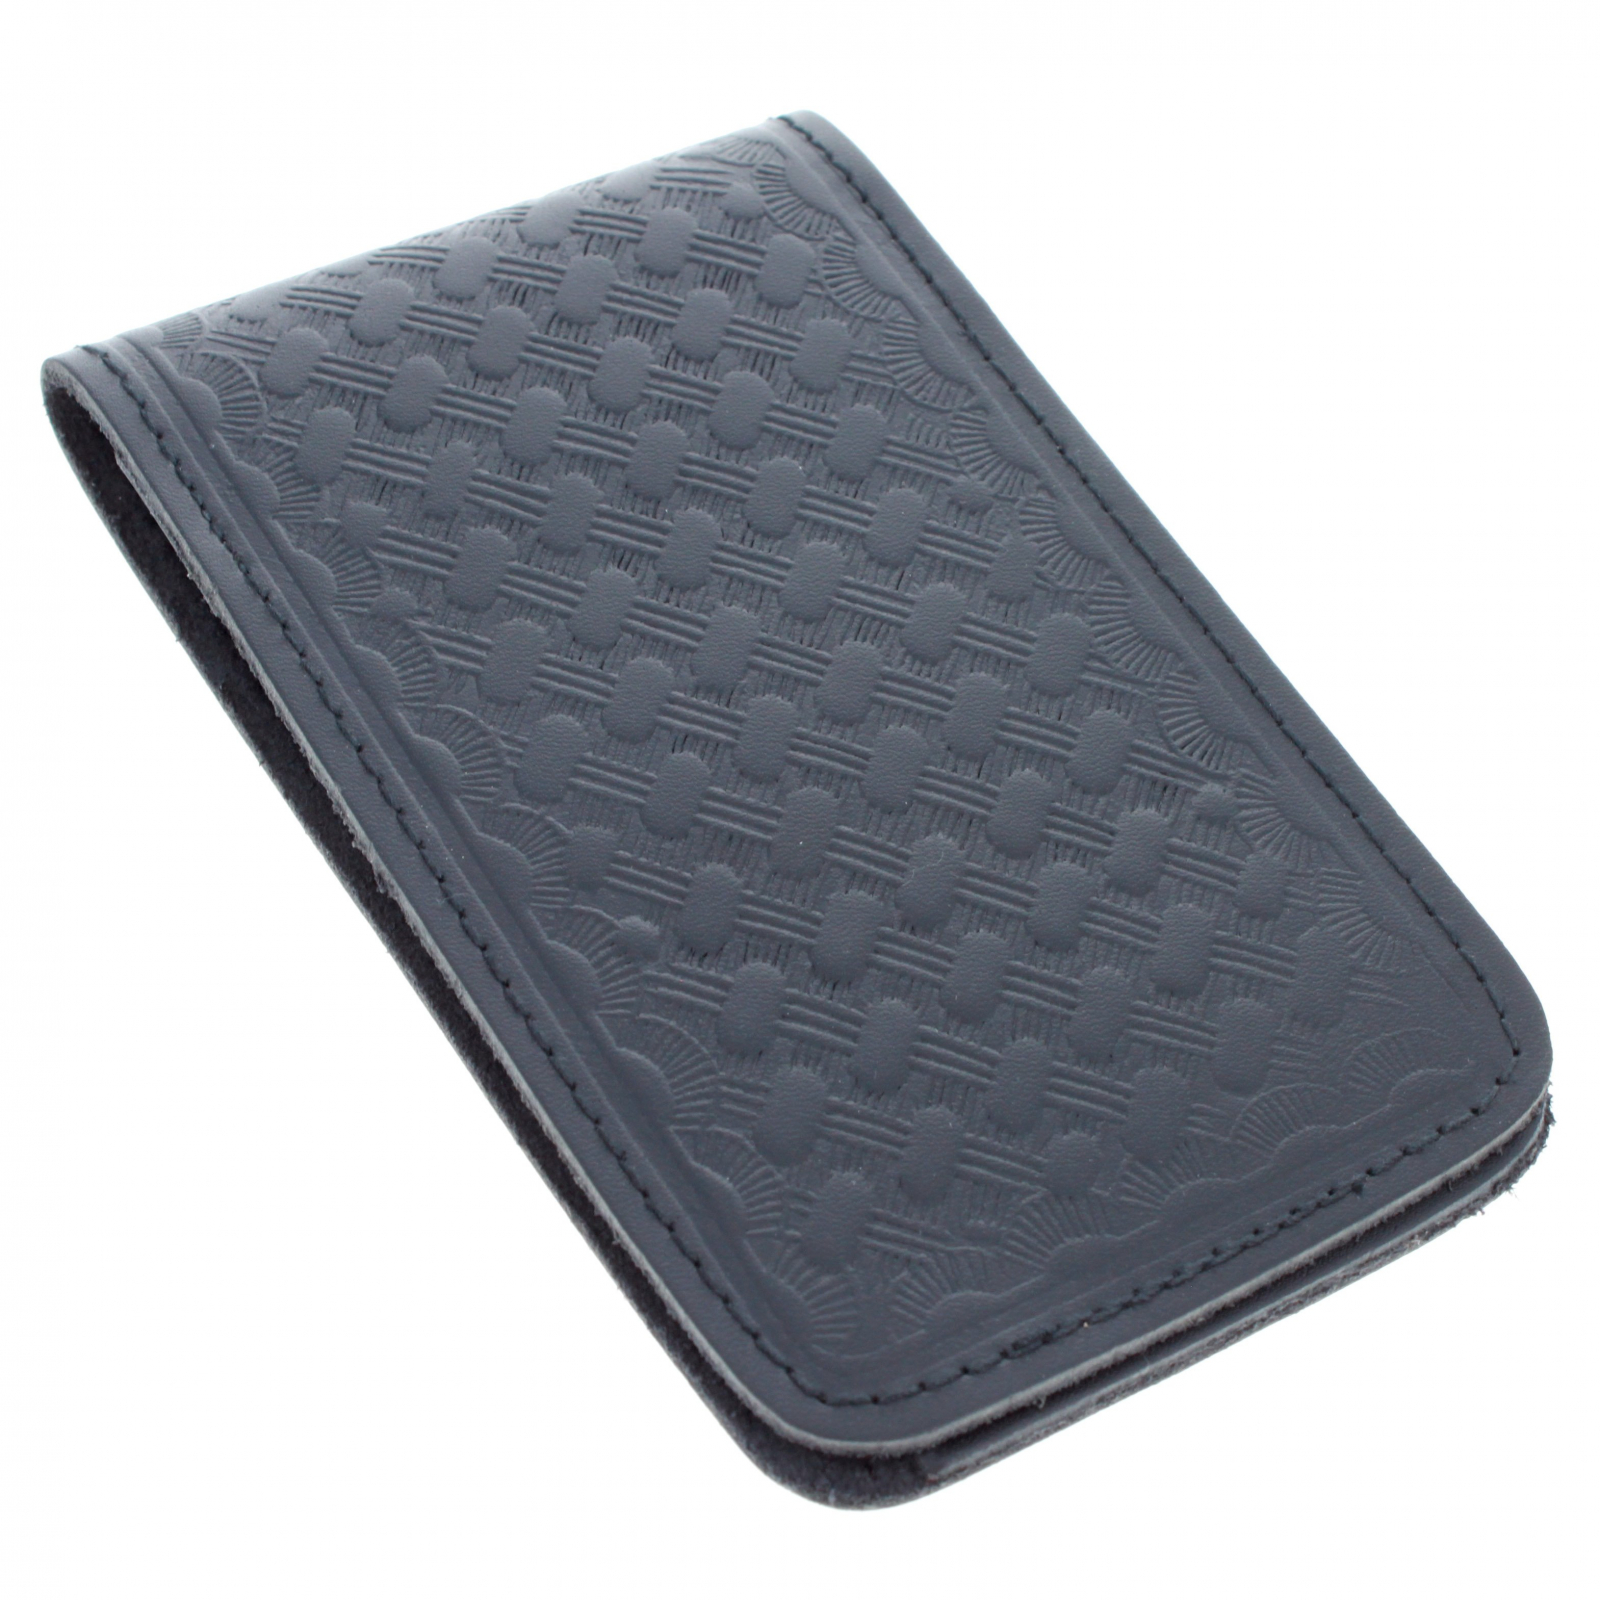 ASR Federal Memo Book Cover - Basket Weave Pattern